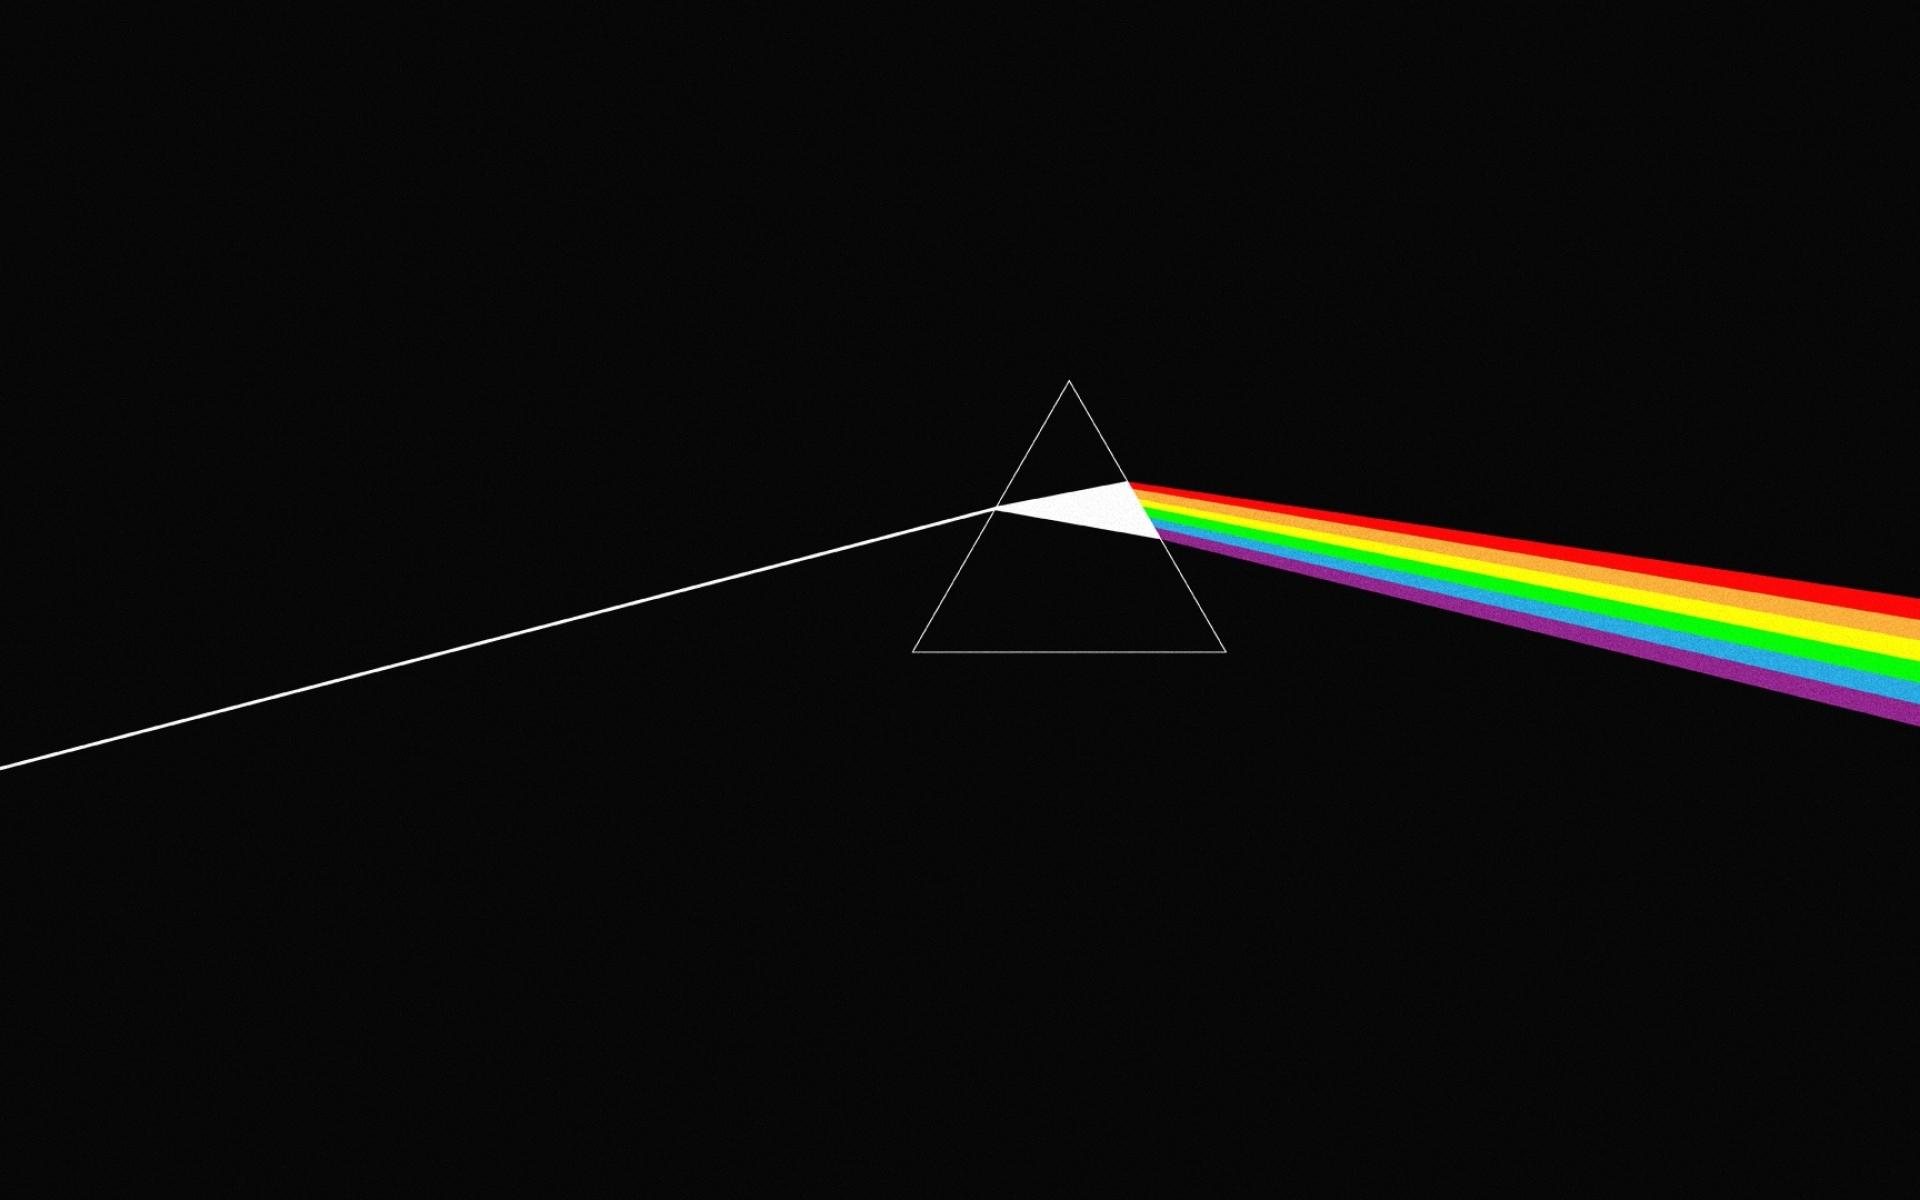 Pink Floydpink floyd 1920x1080 wallpaper 10850download 1920x1200 1920x1200